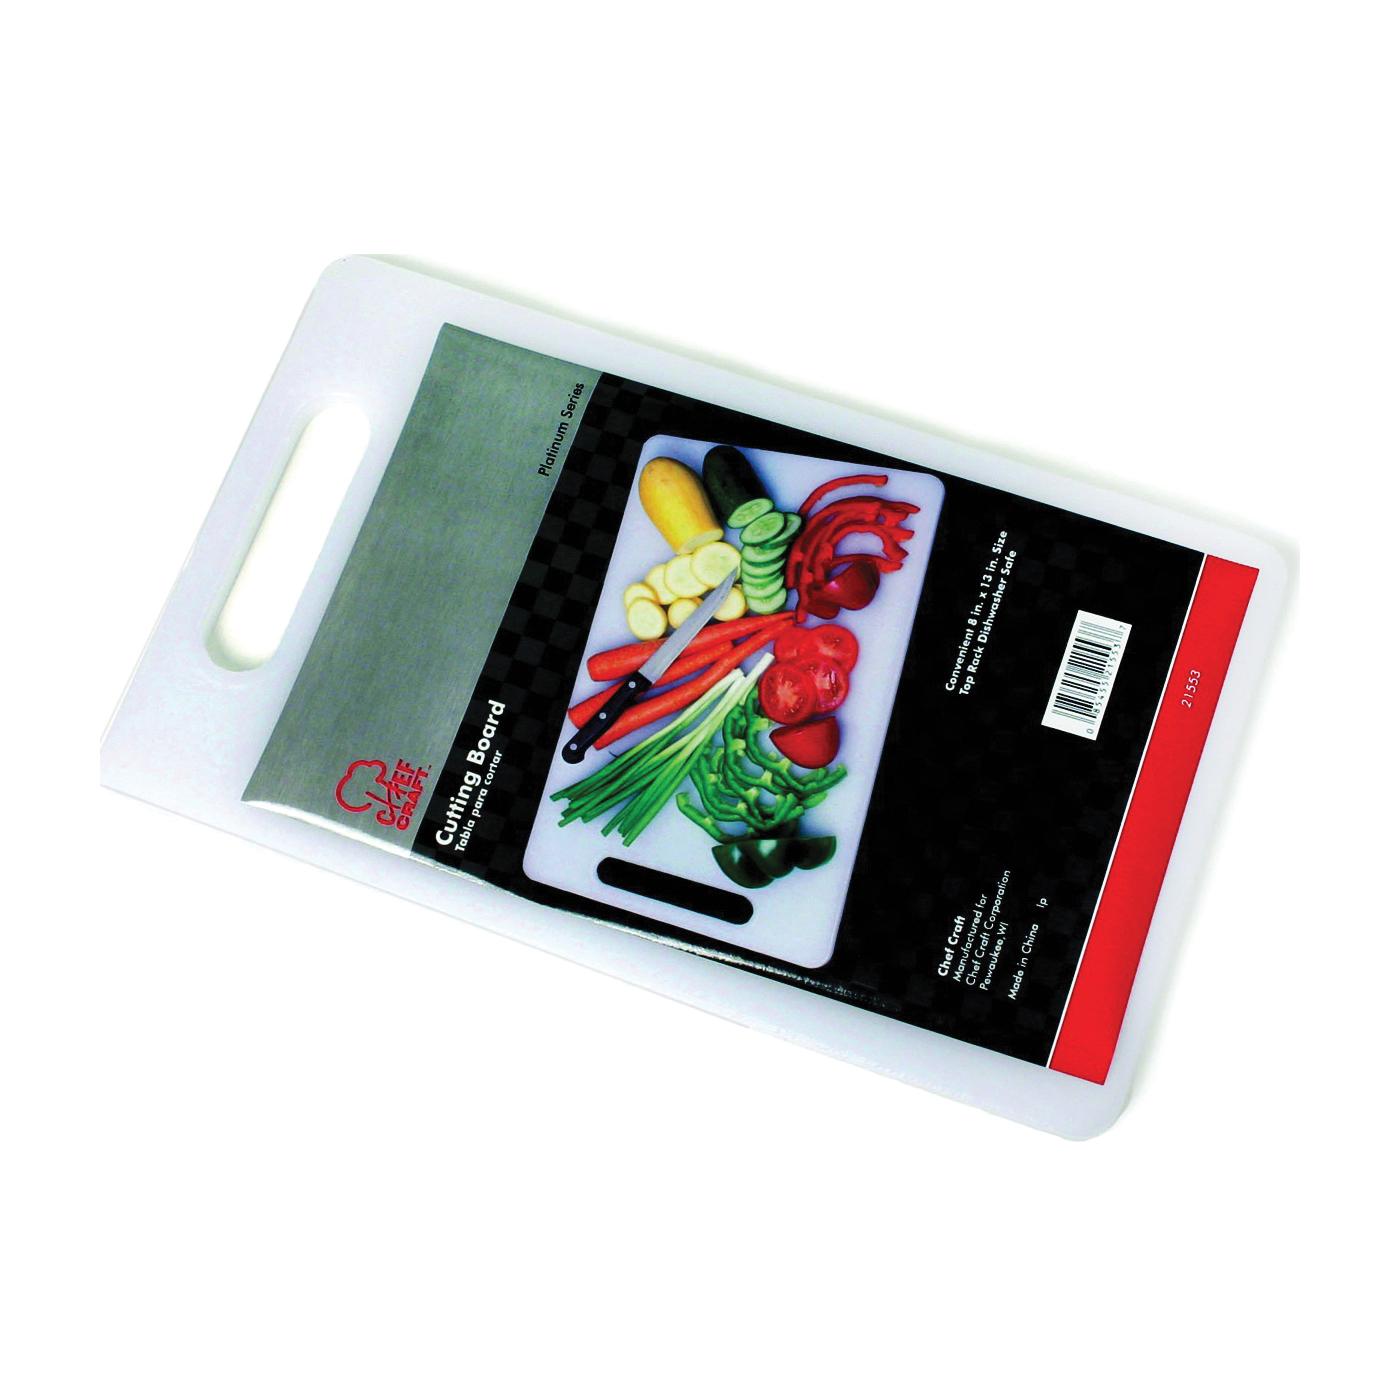 Picture of CHEF CRAFT 21553 Cutting Board, 13 in L, 8 in W, Plastic, White